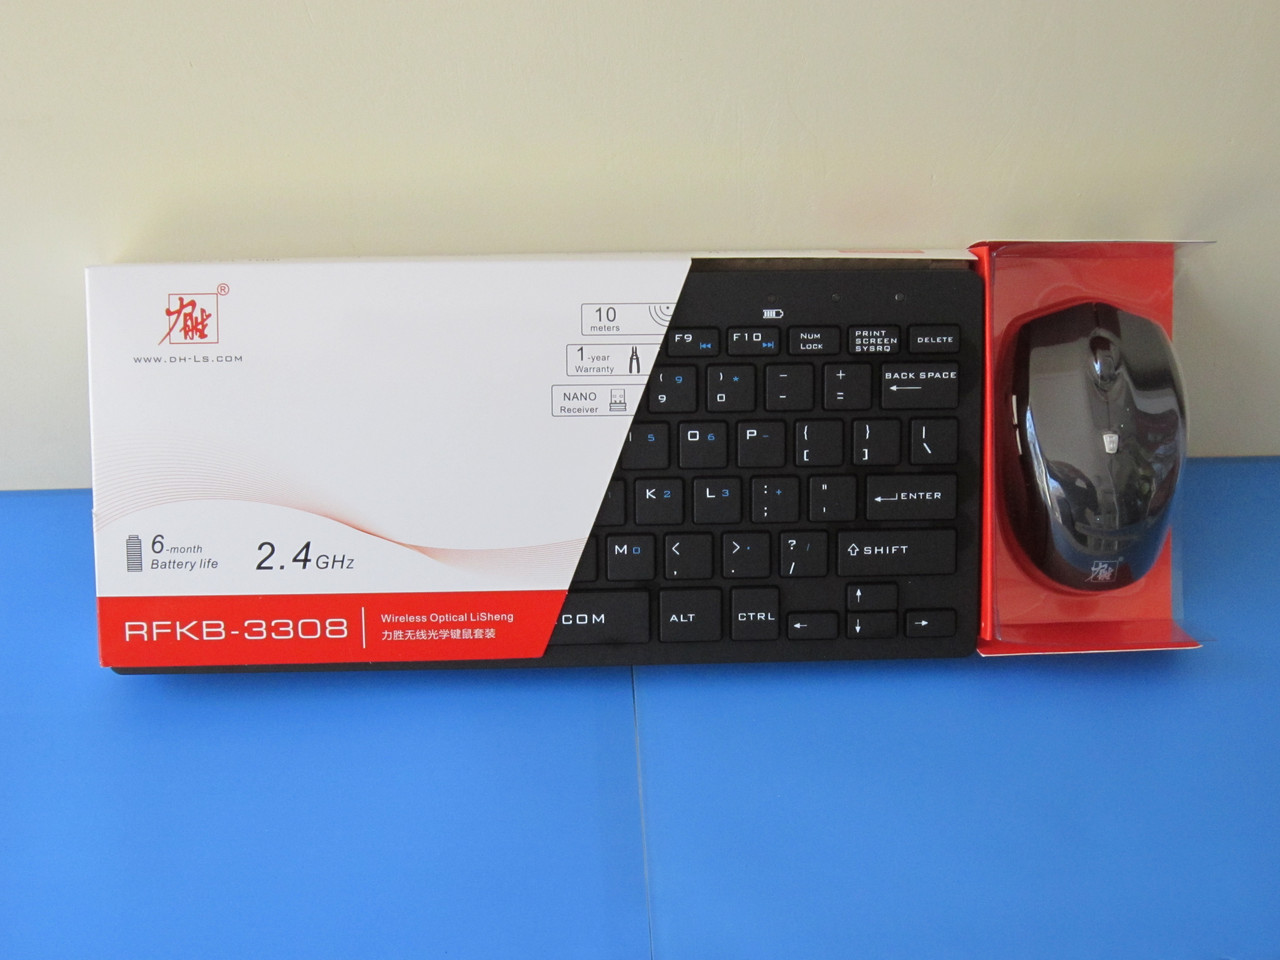 Клавиатура беспроводная + мышь N3308, Алматы